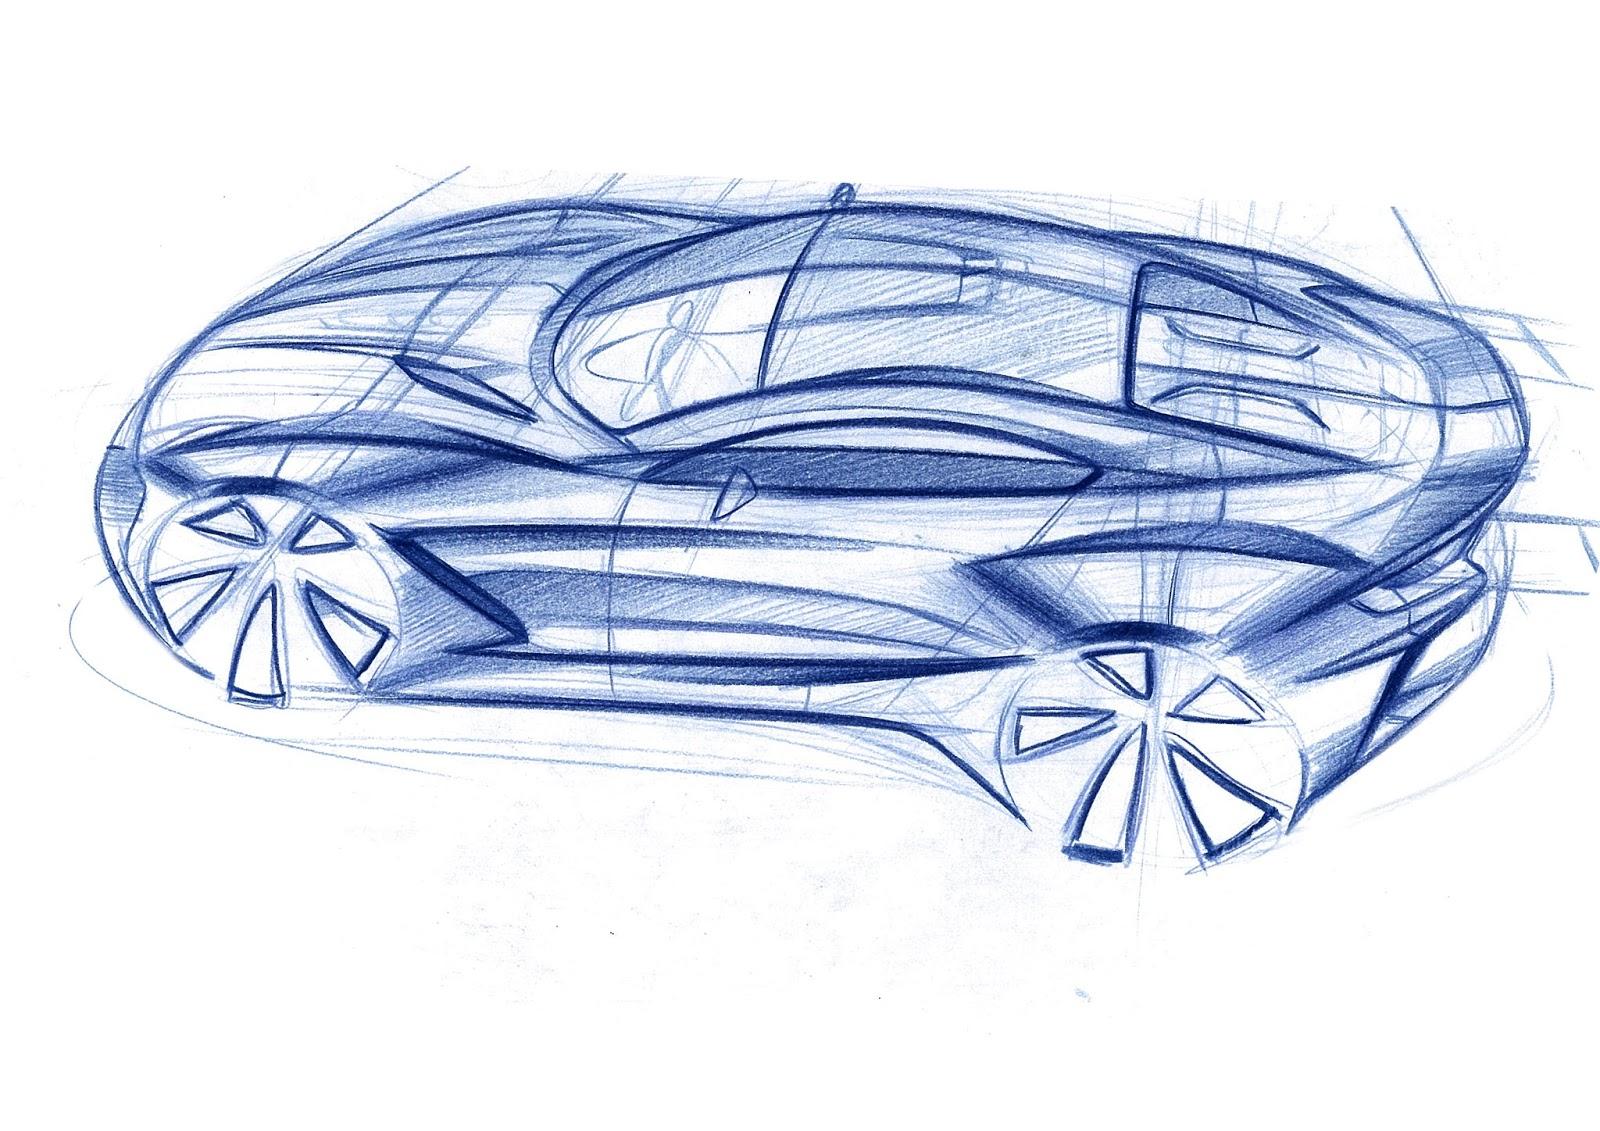 Sketchsite:Barrett: Random sports car sketch